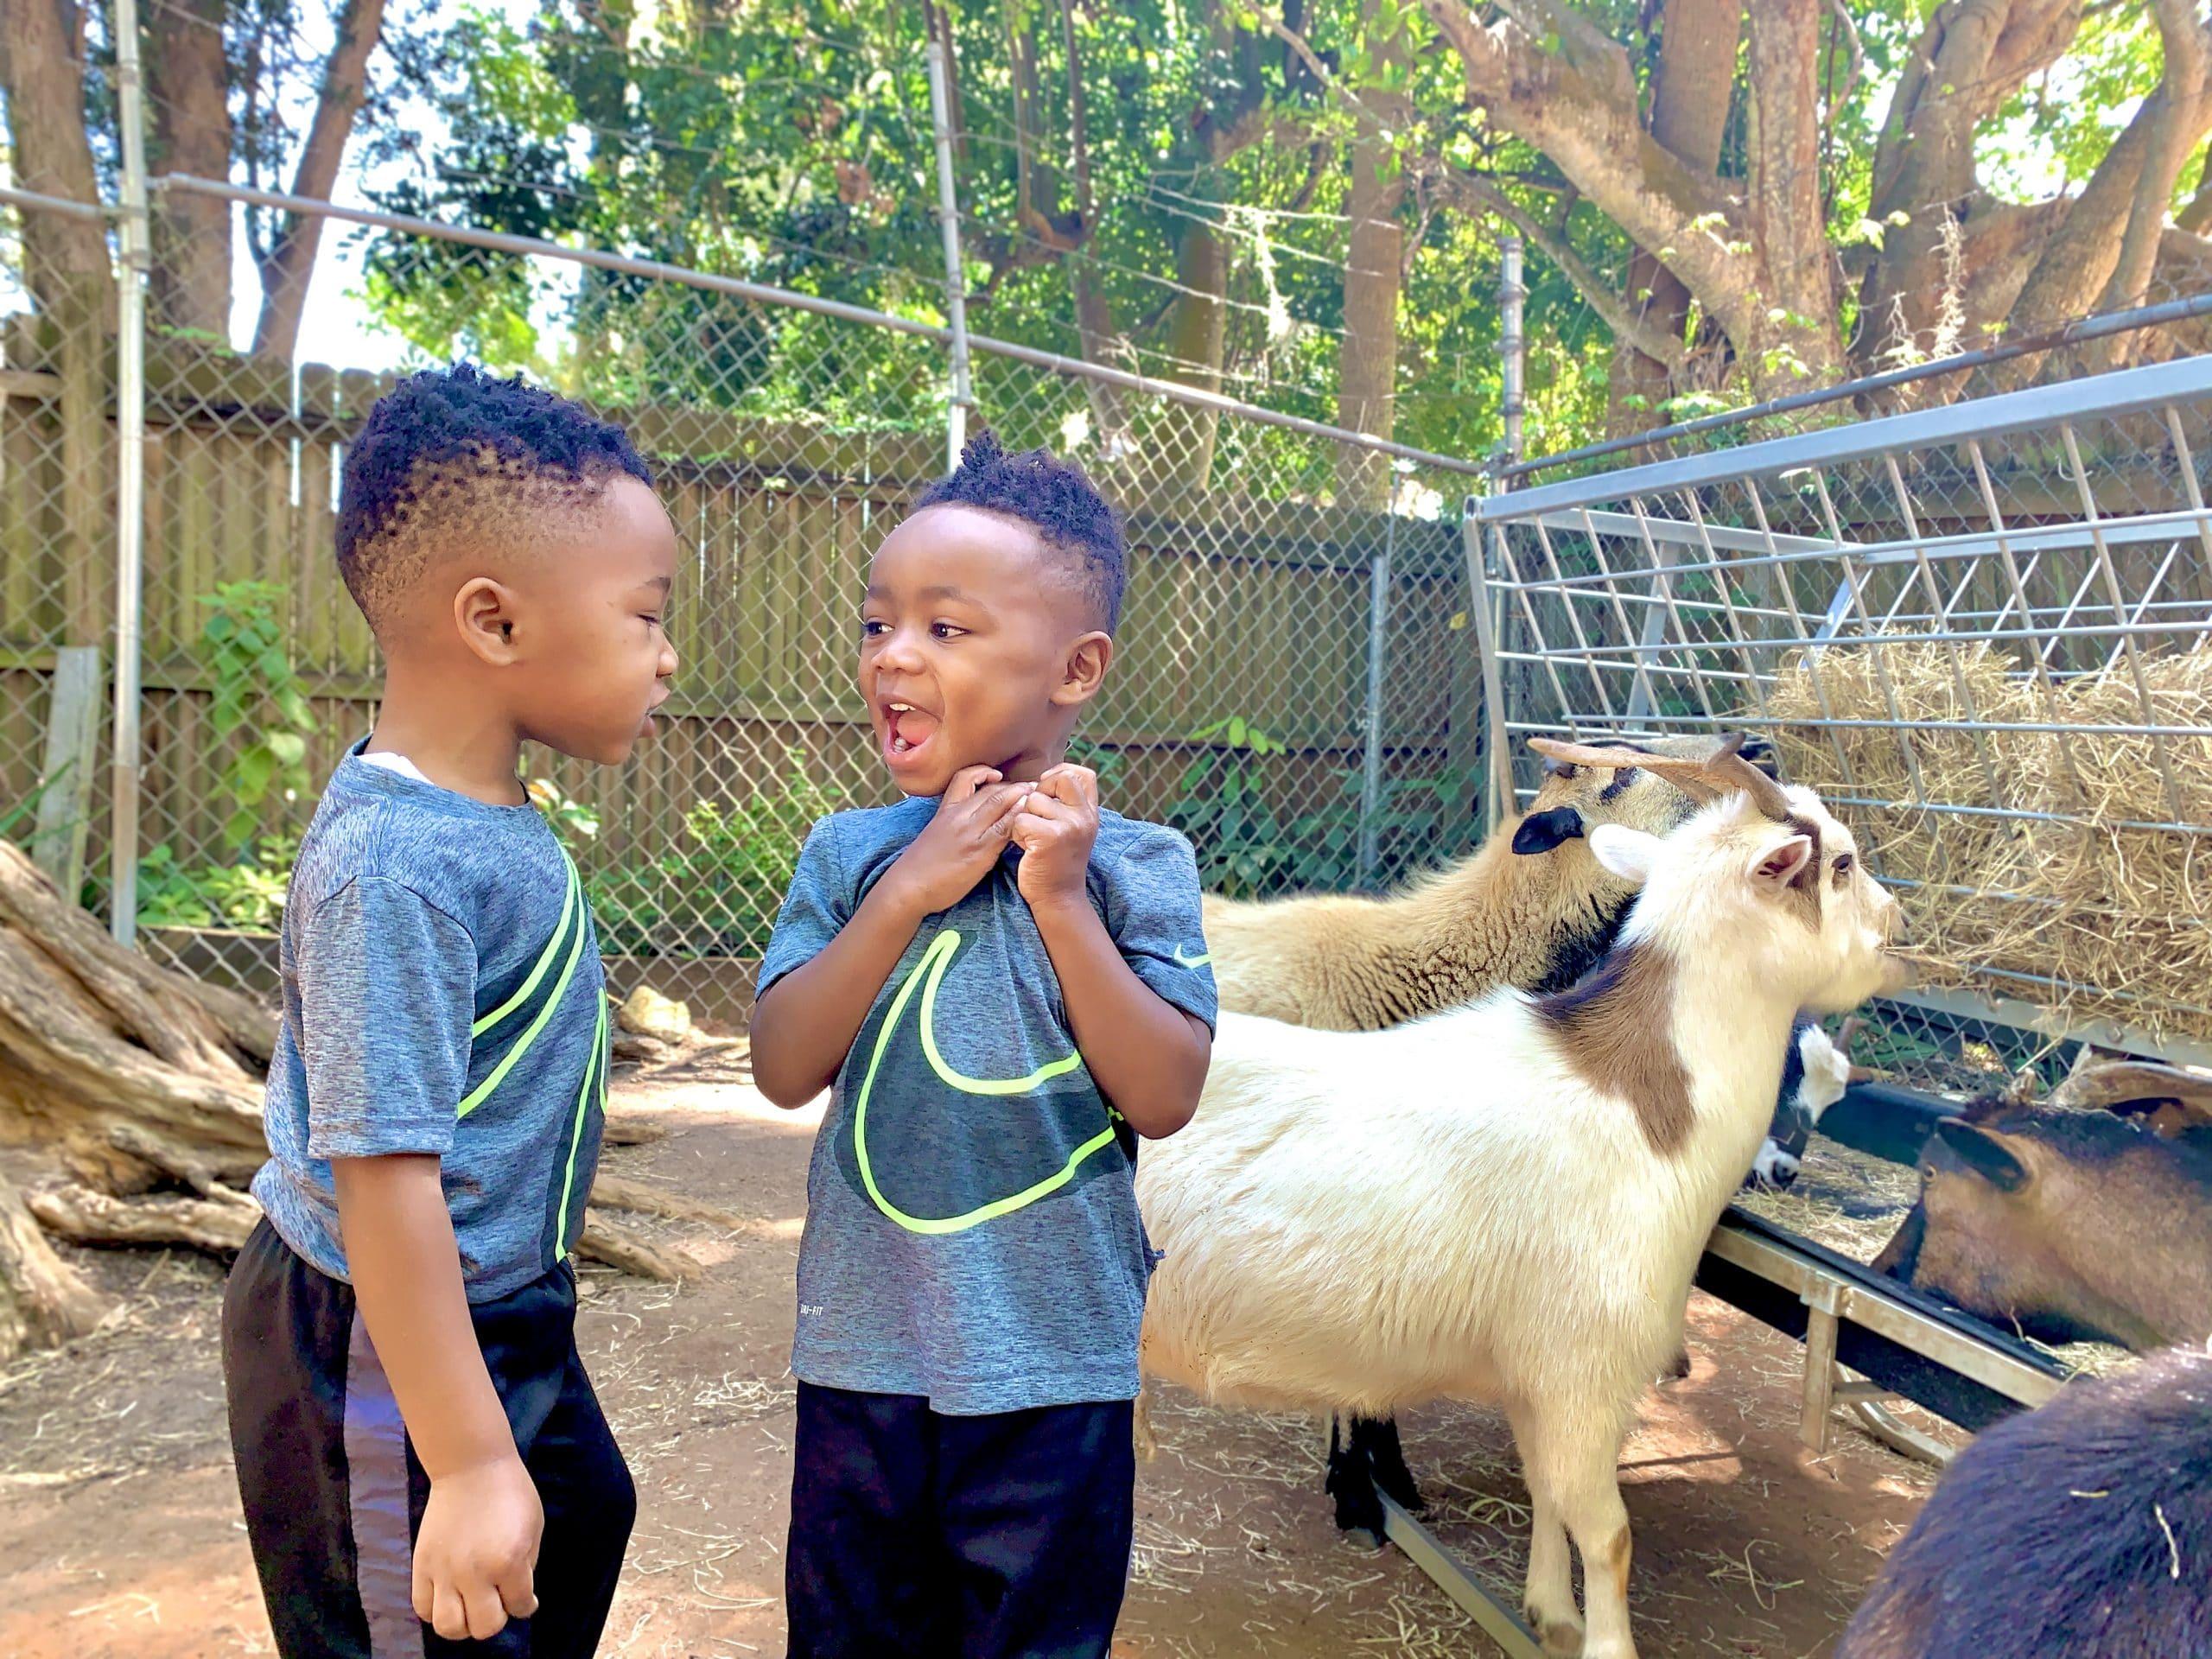 Sarasota Things to do with kids